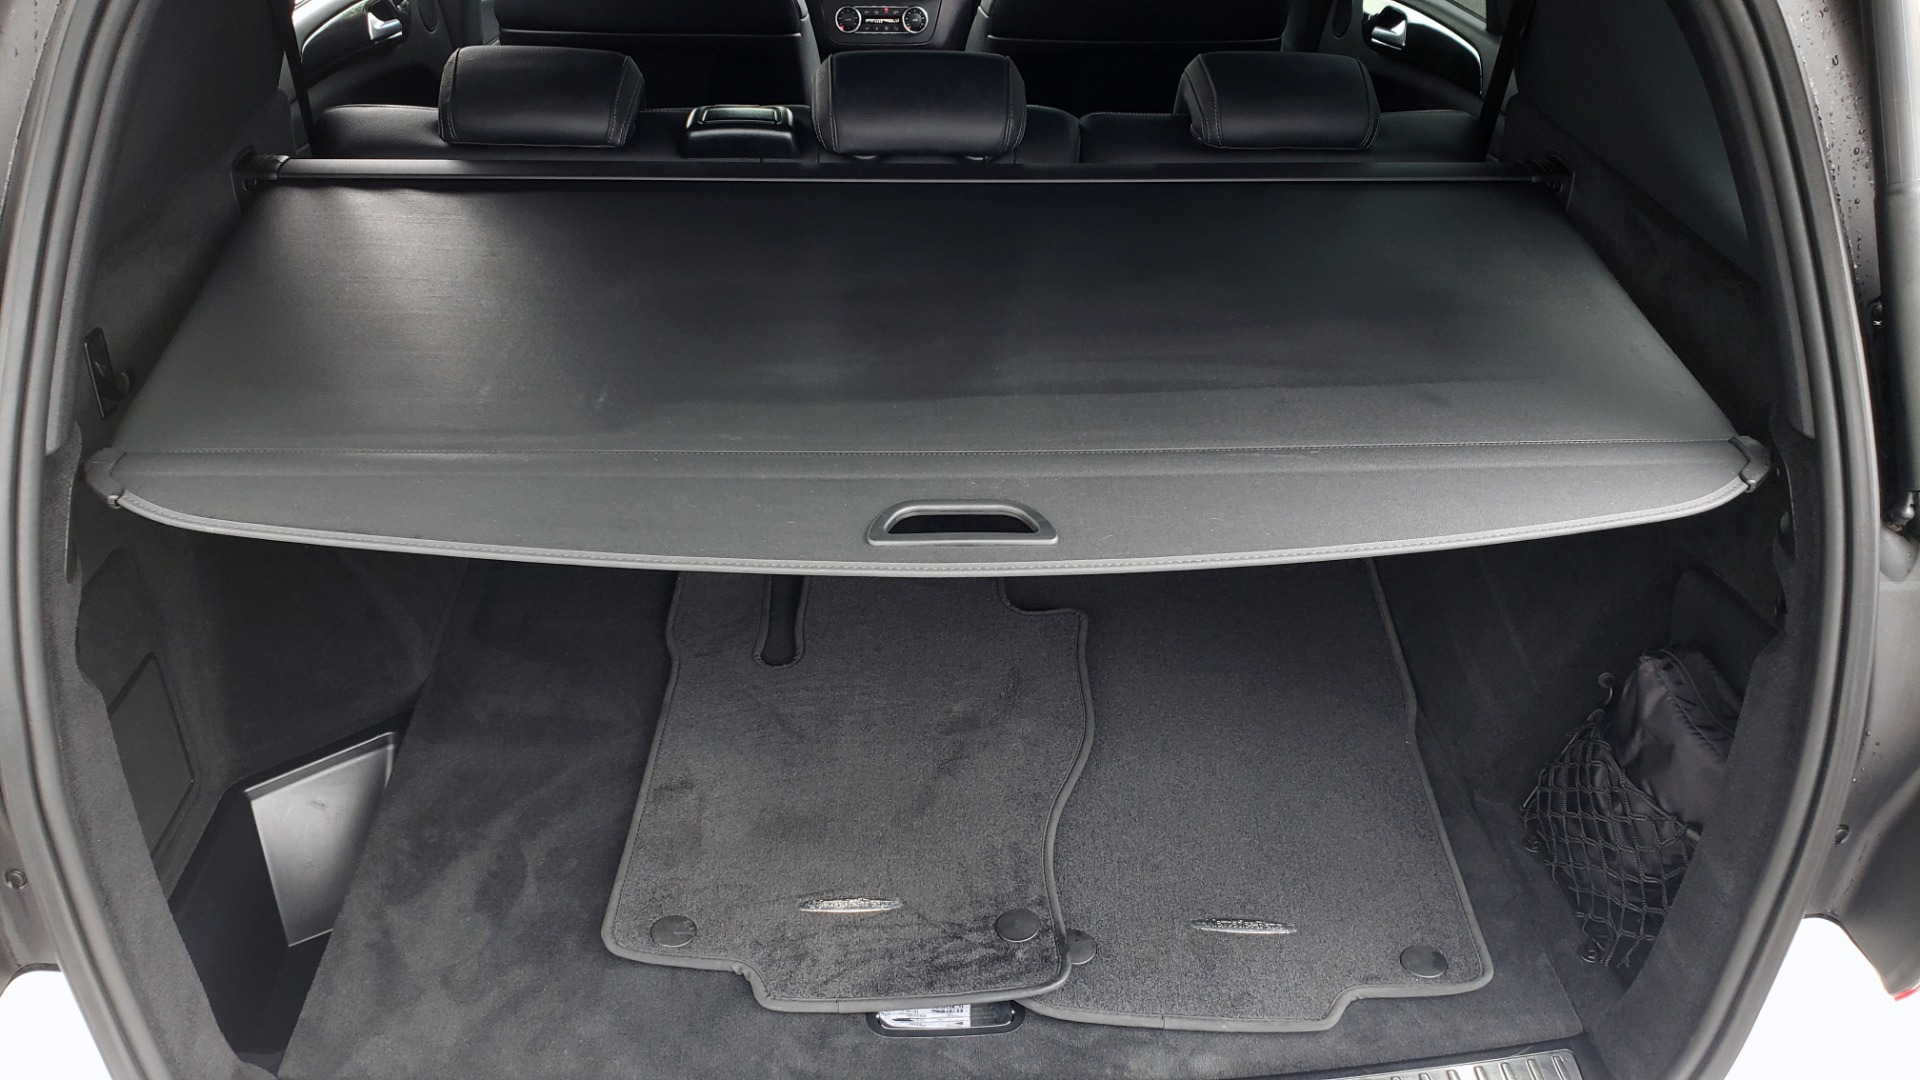 Used 2018 Mercedes-Benz GLE 350 4MATIC / PREM PKG / NAV / PARK ASST / K/H SND / HITCH / REARVIEW for sale $40,801 at Formula Imports in Charlotte NC 28227 17